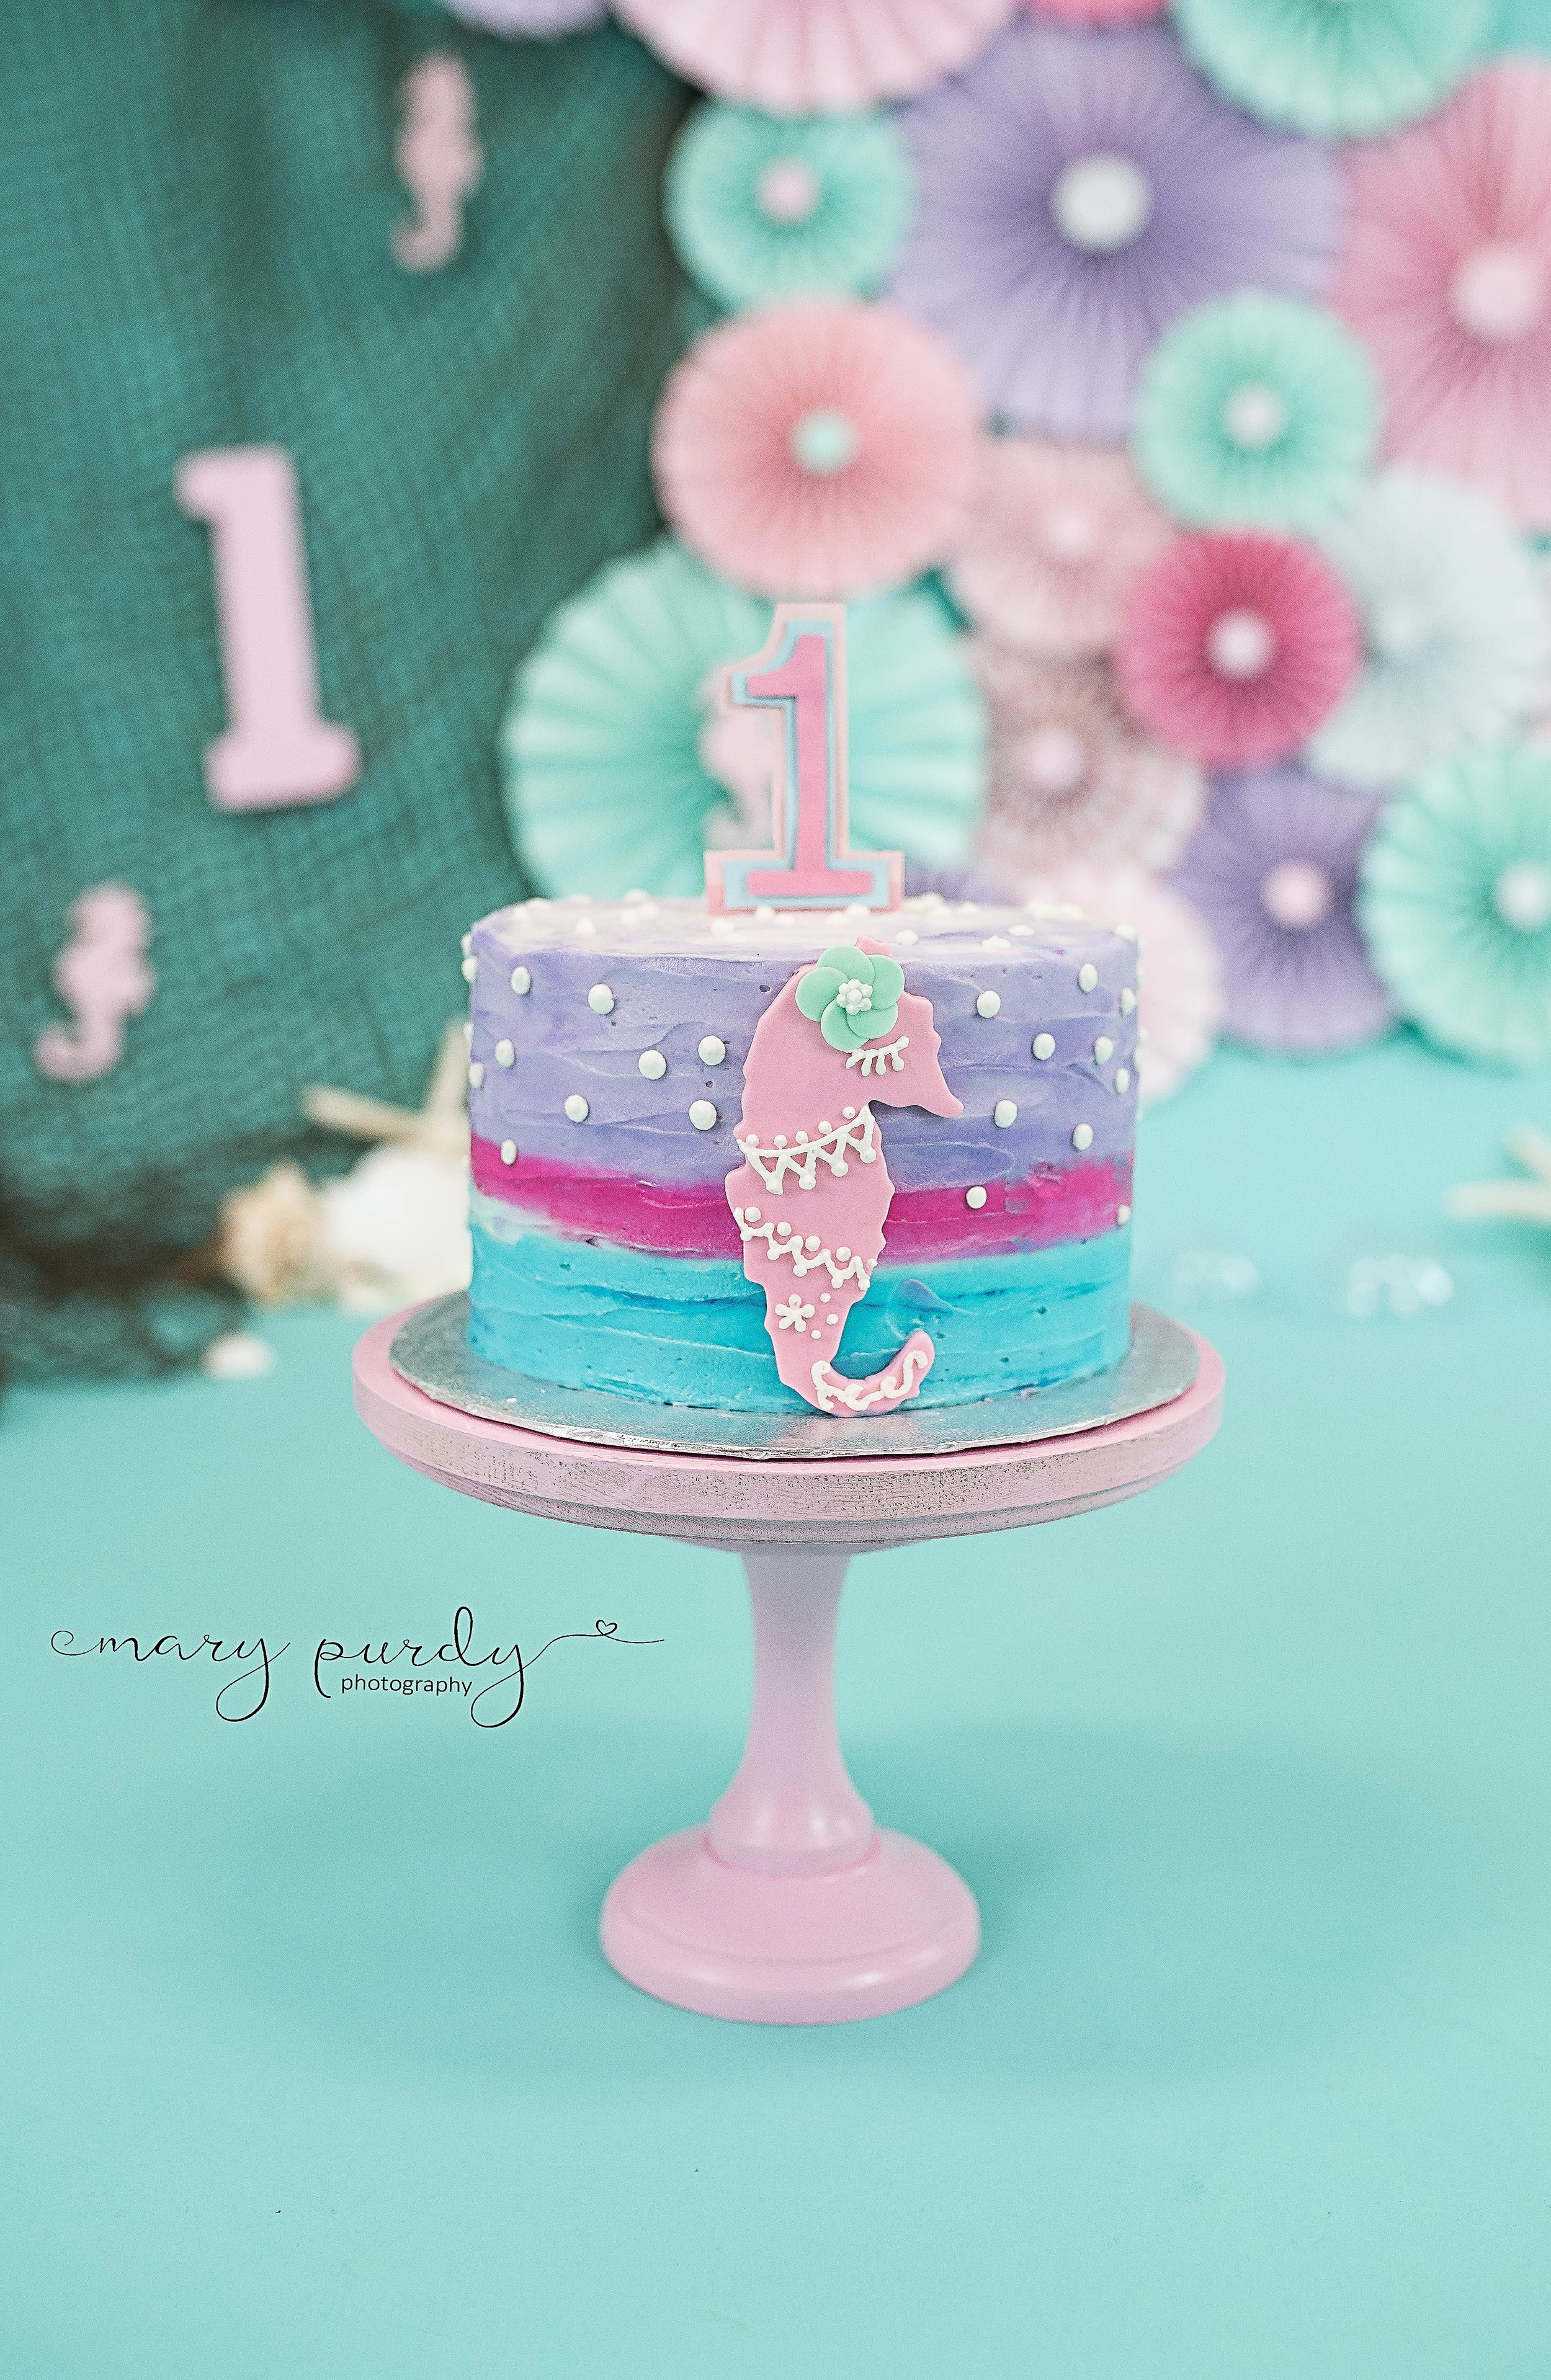 Seahorse Cake Smash 3 Mary Purdy